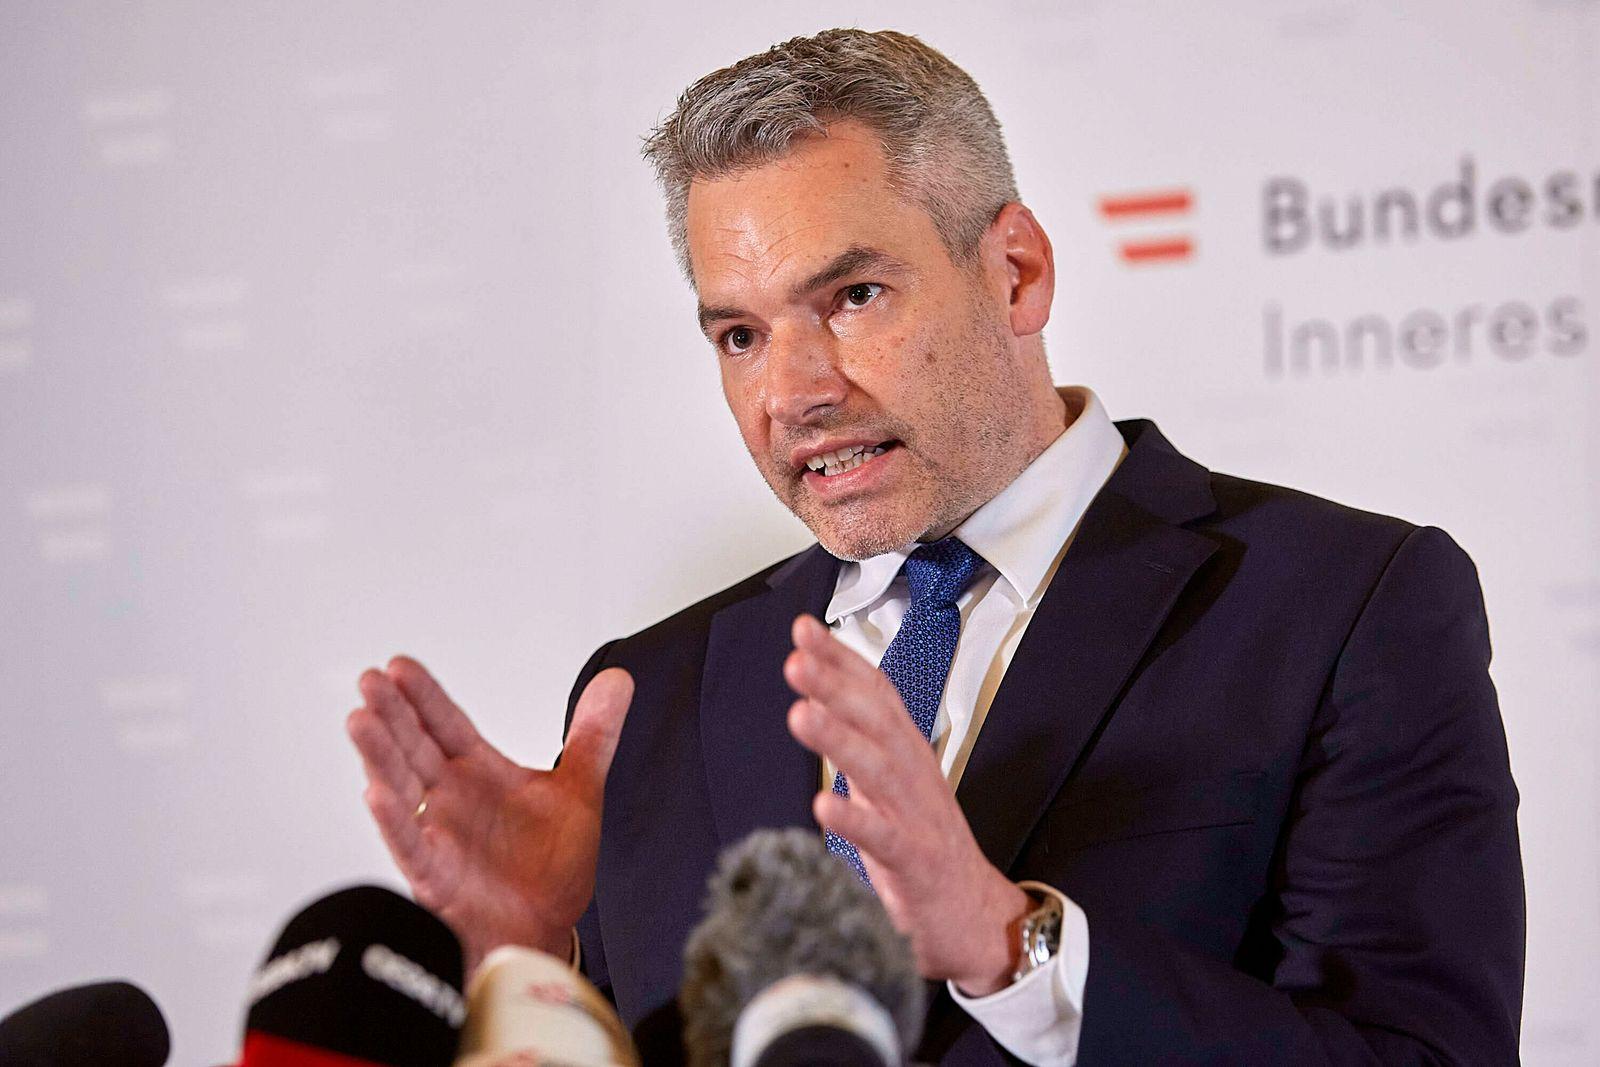 (201103) -- VIENNA, Nov. 3, 2020 -- Austrian Interior Minister Karl Nehammer speaks at a press conference in Vienna, ca